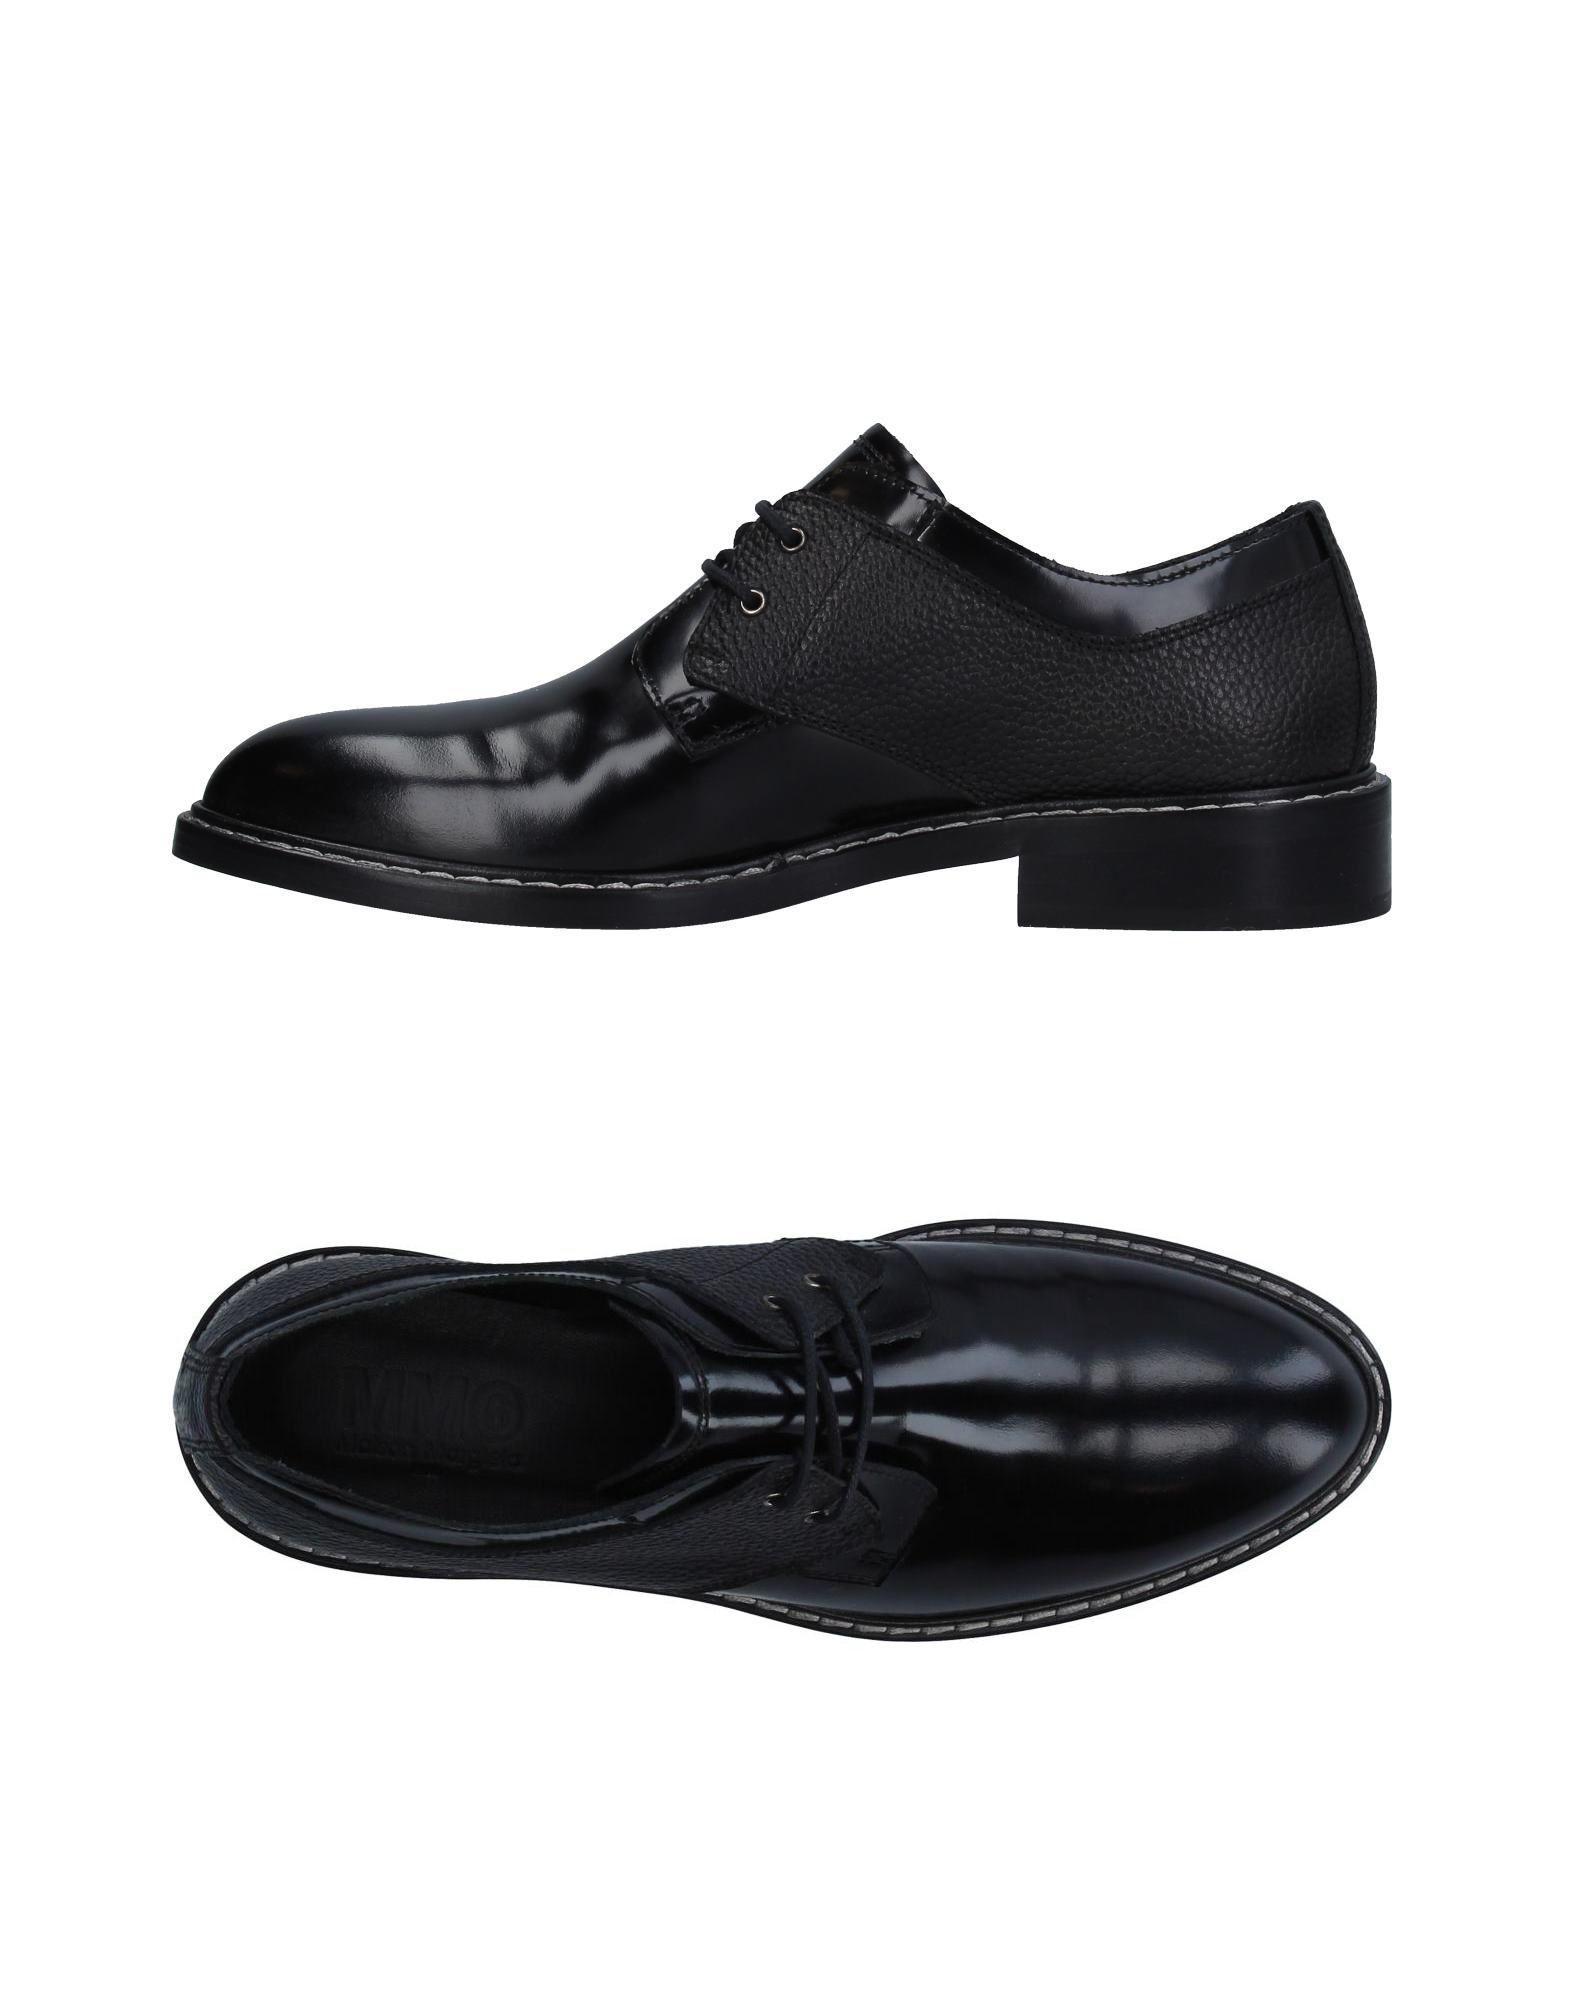 Mm6 Maison Margiela Lace-up Shoes In Black